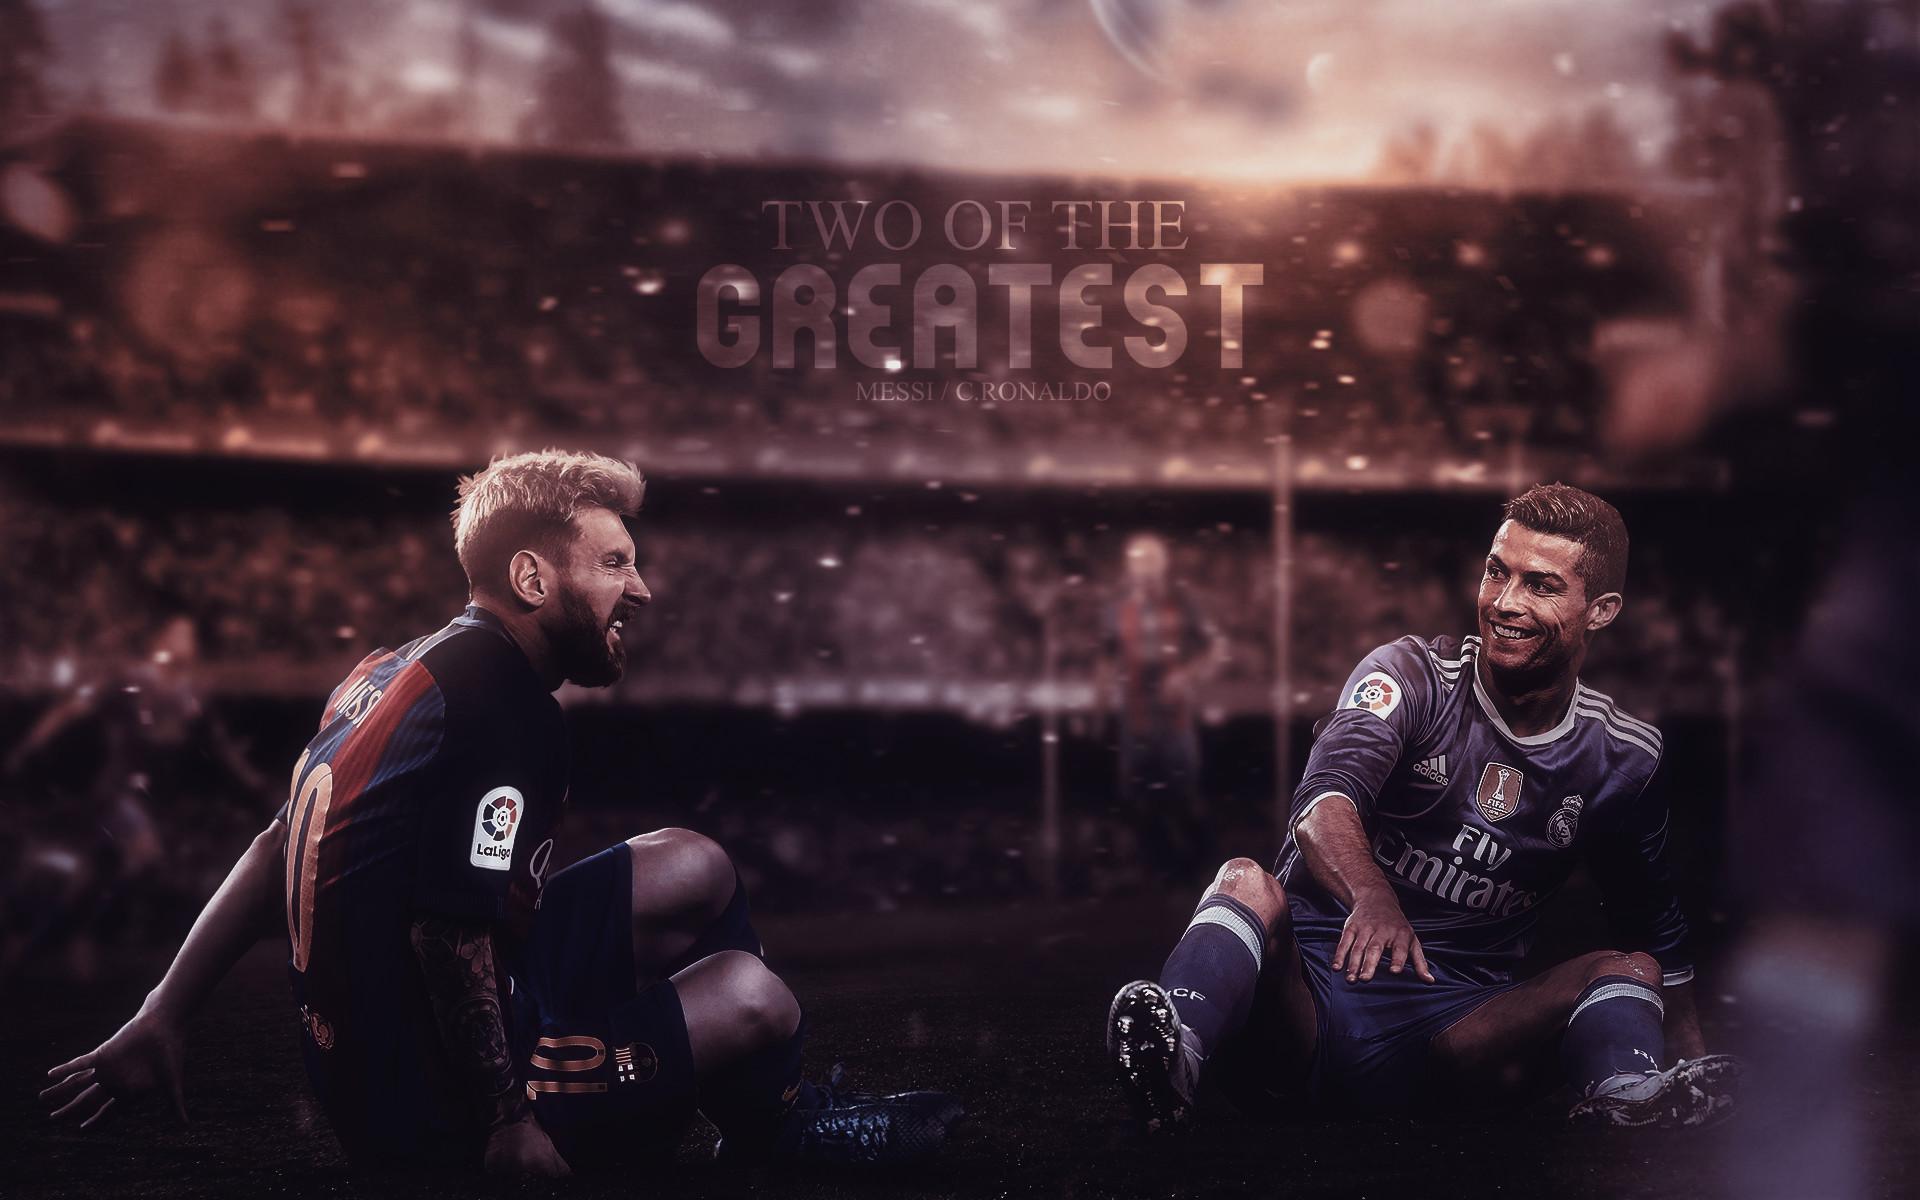 Lionel Messi Wallpaper 2018 (74+ images)